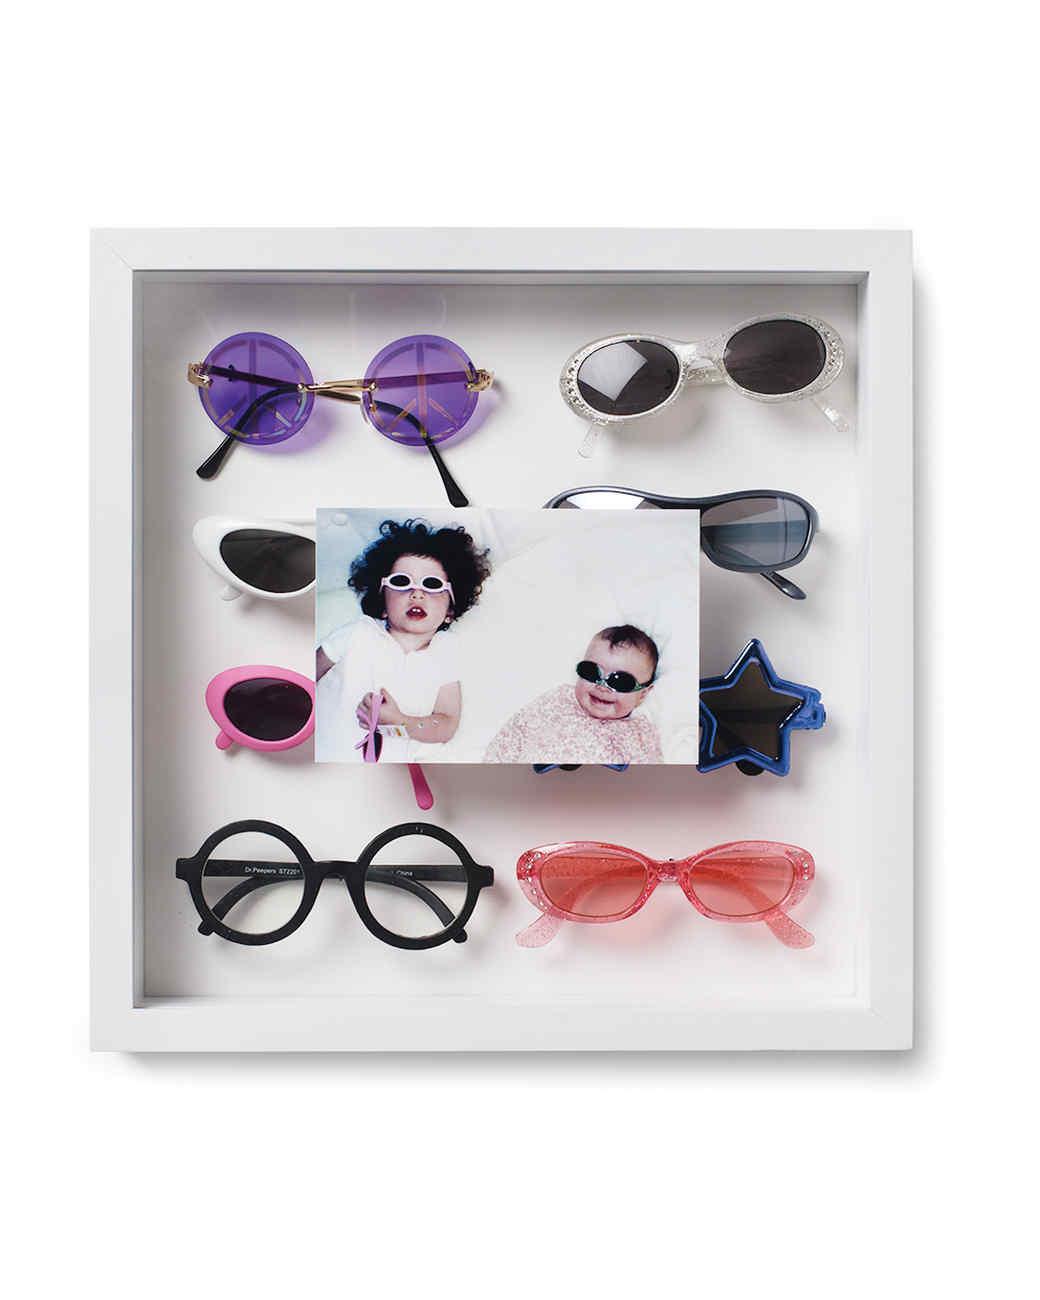 mld105337_0210_sunglasses.jpg